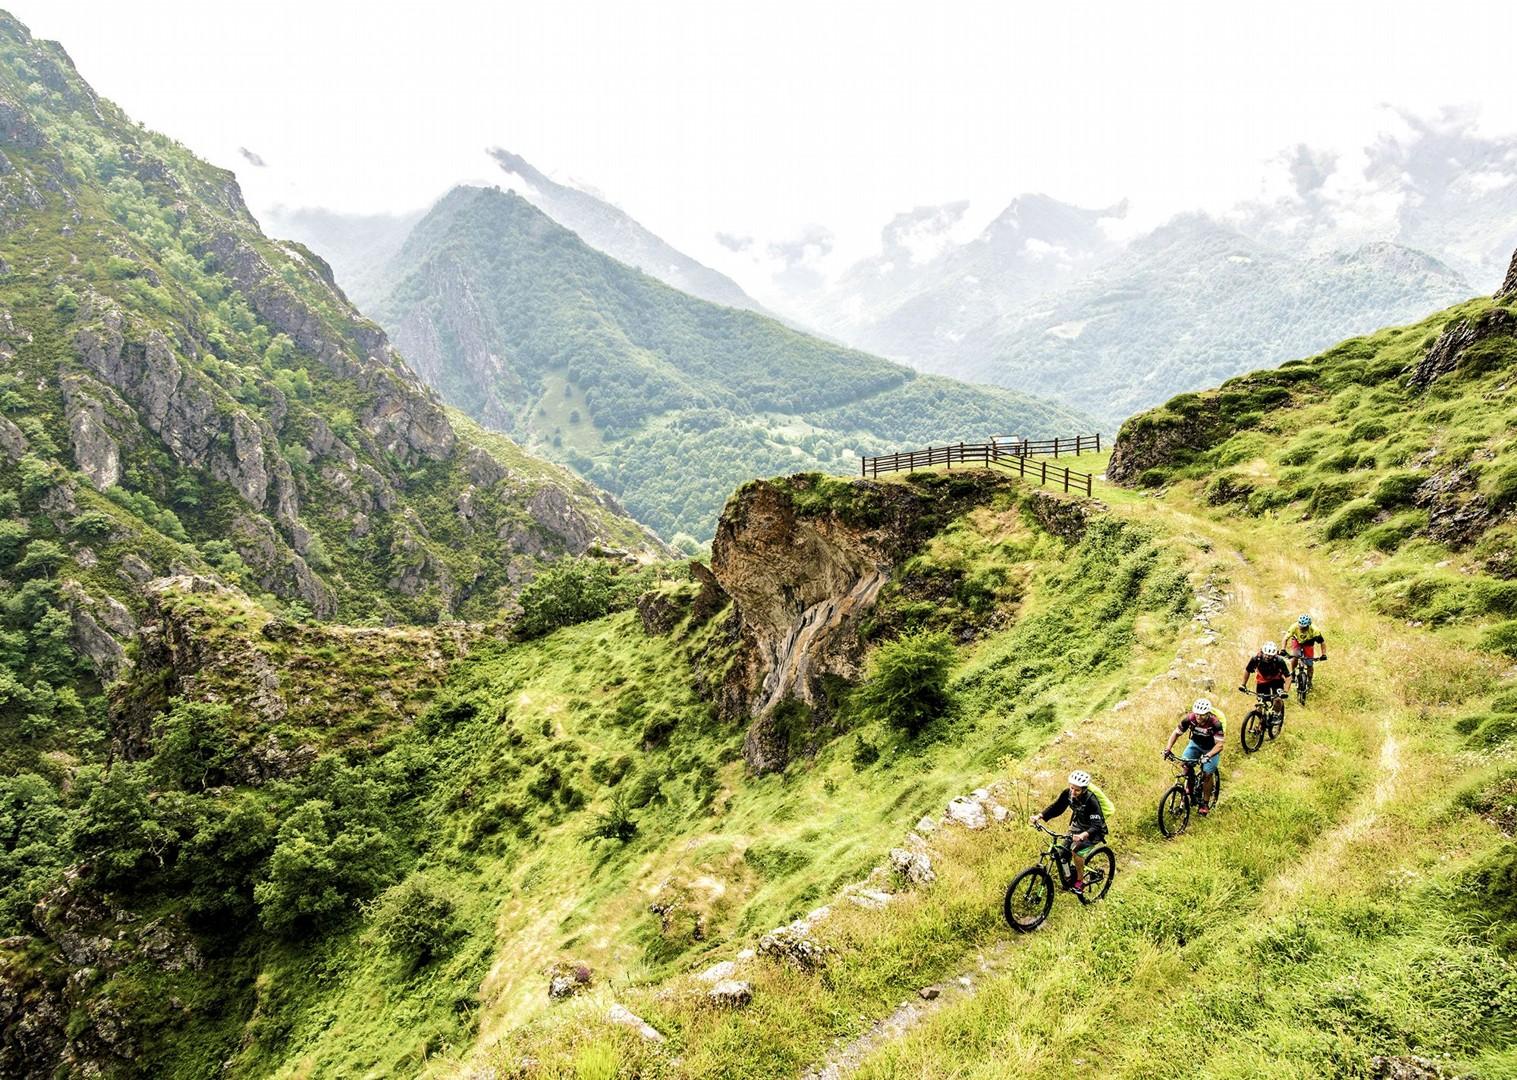 day3_northern_spain_149 copy.jpg - Spain - Picos de Europa - Trans Picos - Guided Mountain Bike Holiday - Mountain Biking